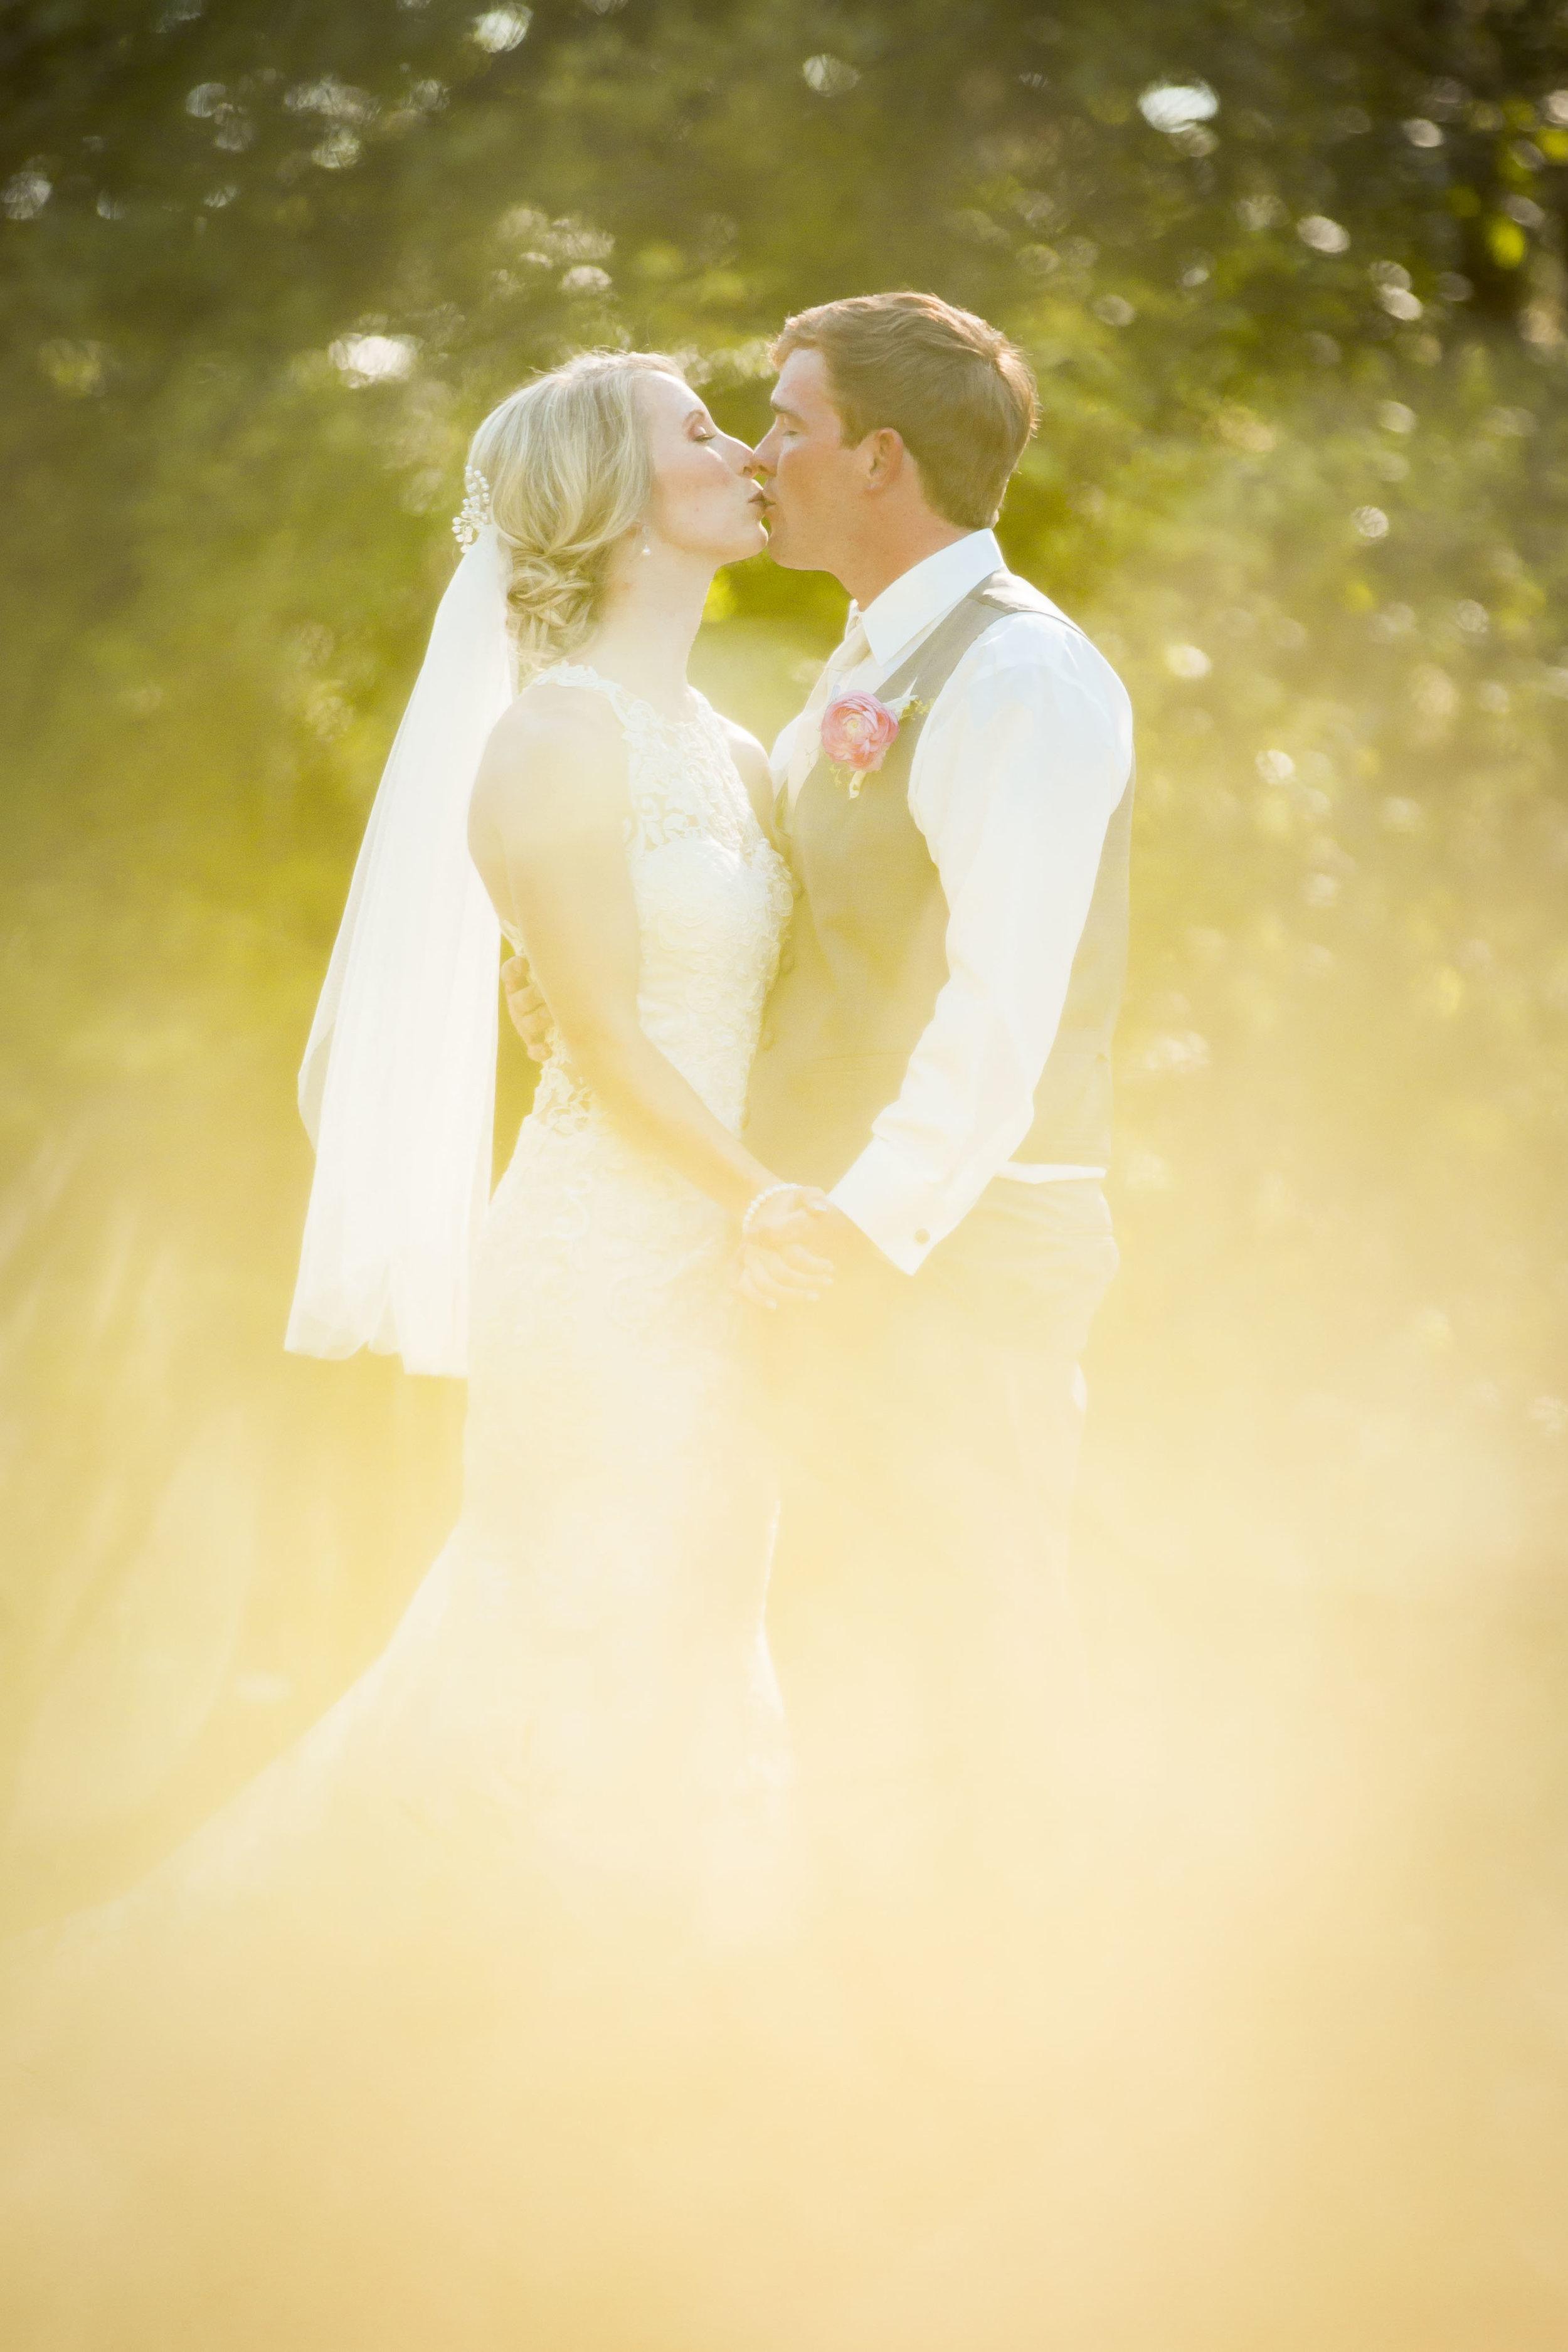 Portraits Kalee and Charlie - Dillon Vibes Photography-4.jpg